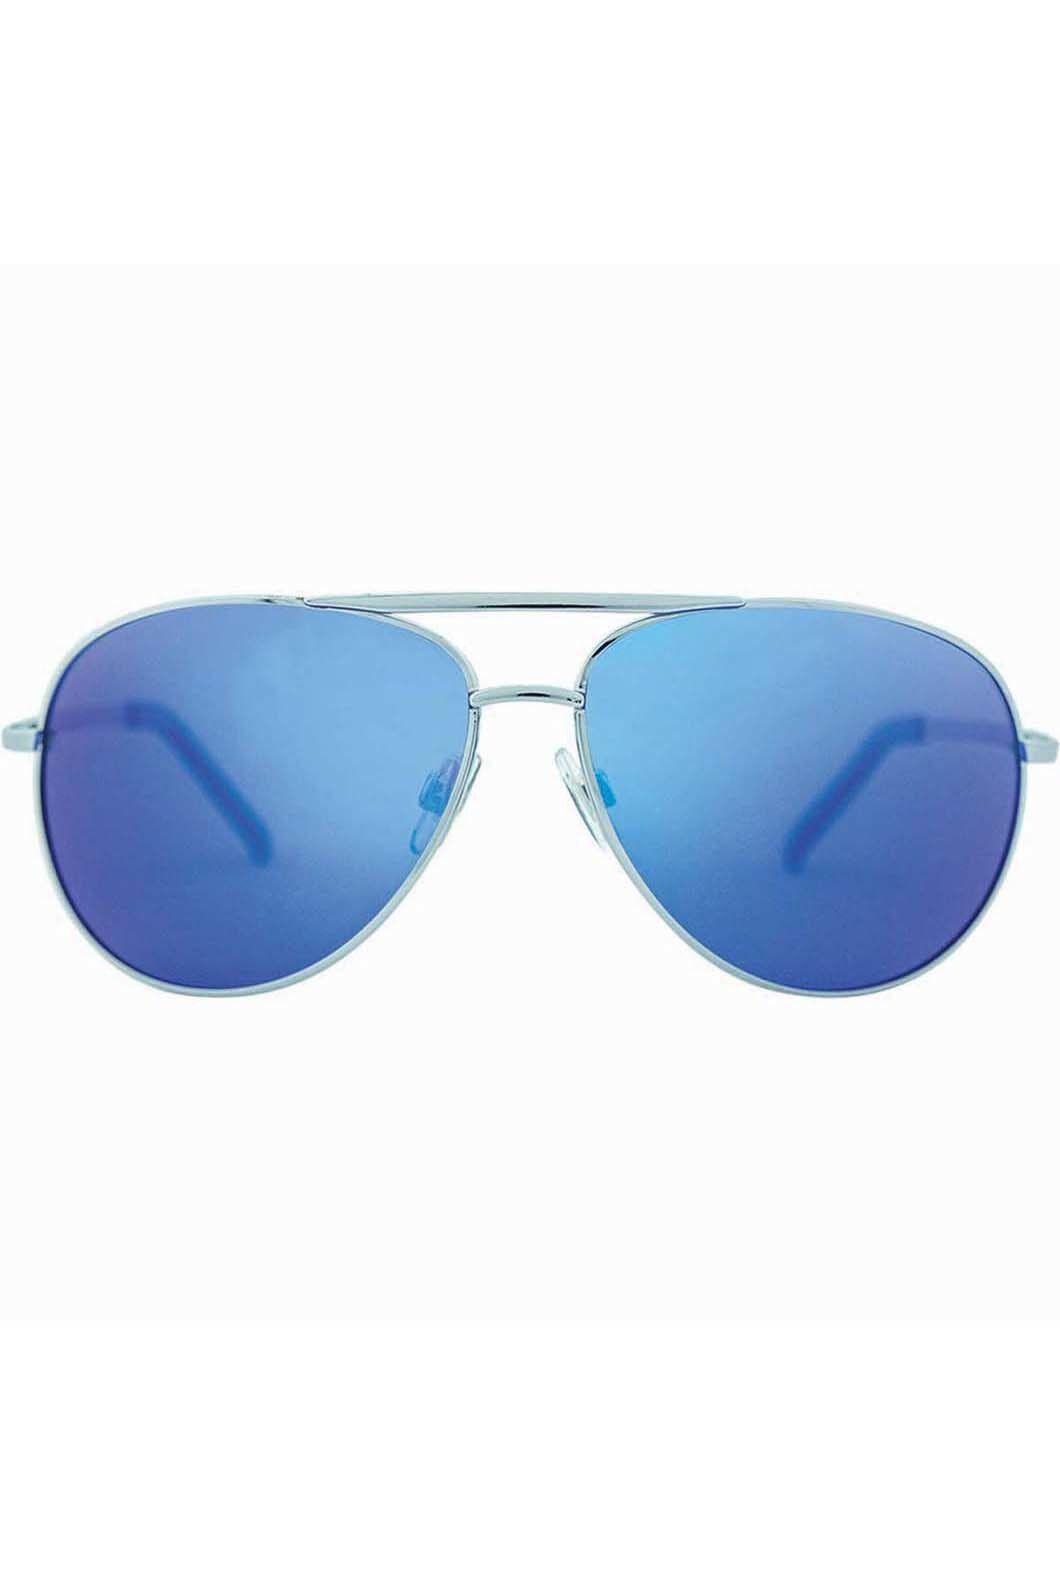 Venture Eyewear Women's Viper Sunglasses, Silver/Blue, hi-res